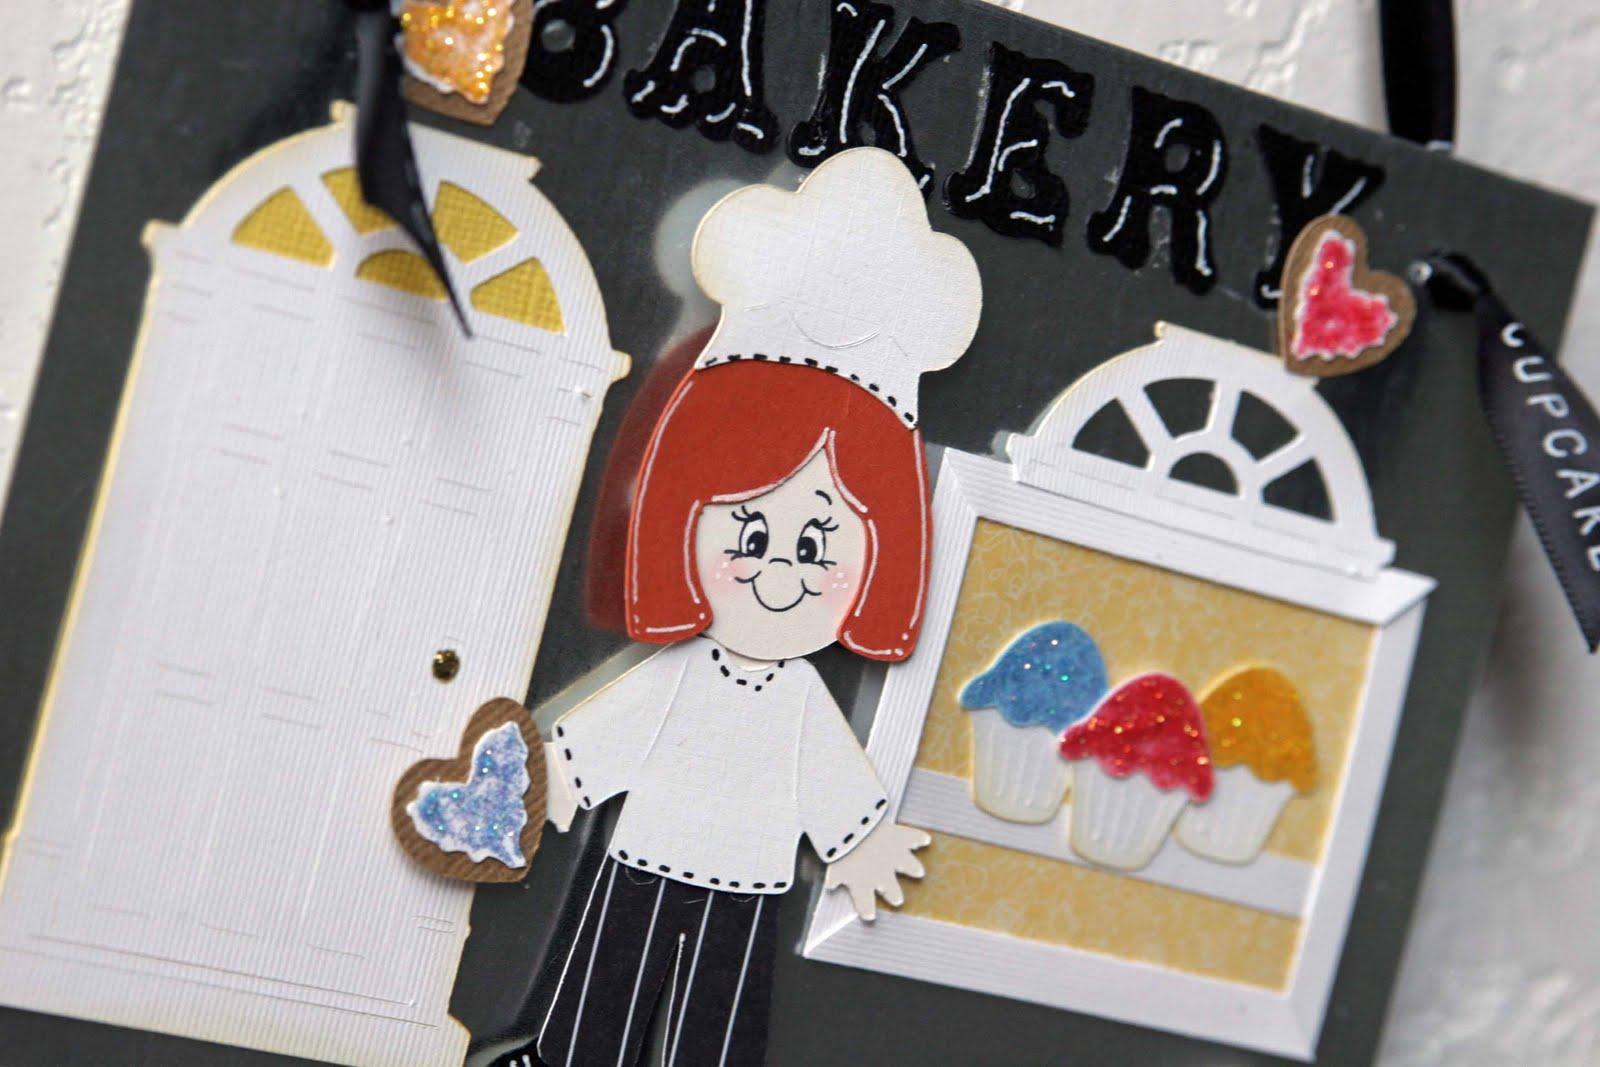 doll, cupcakes, cookies